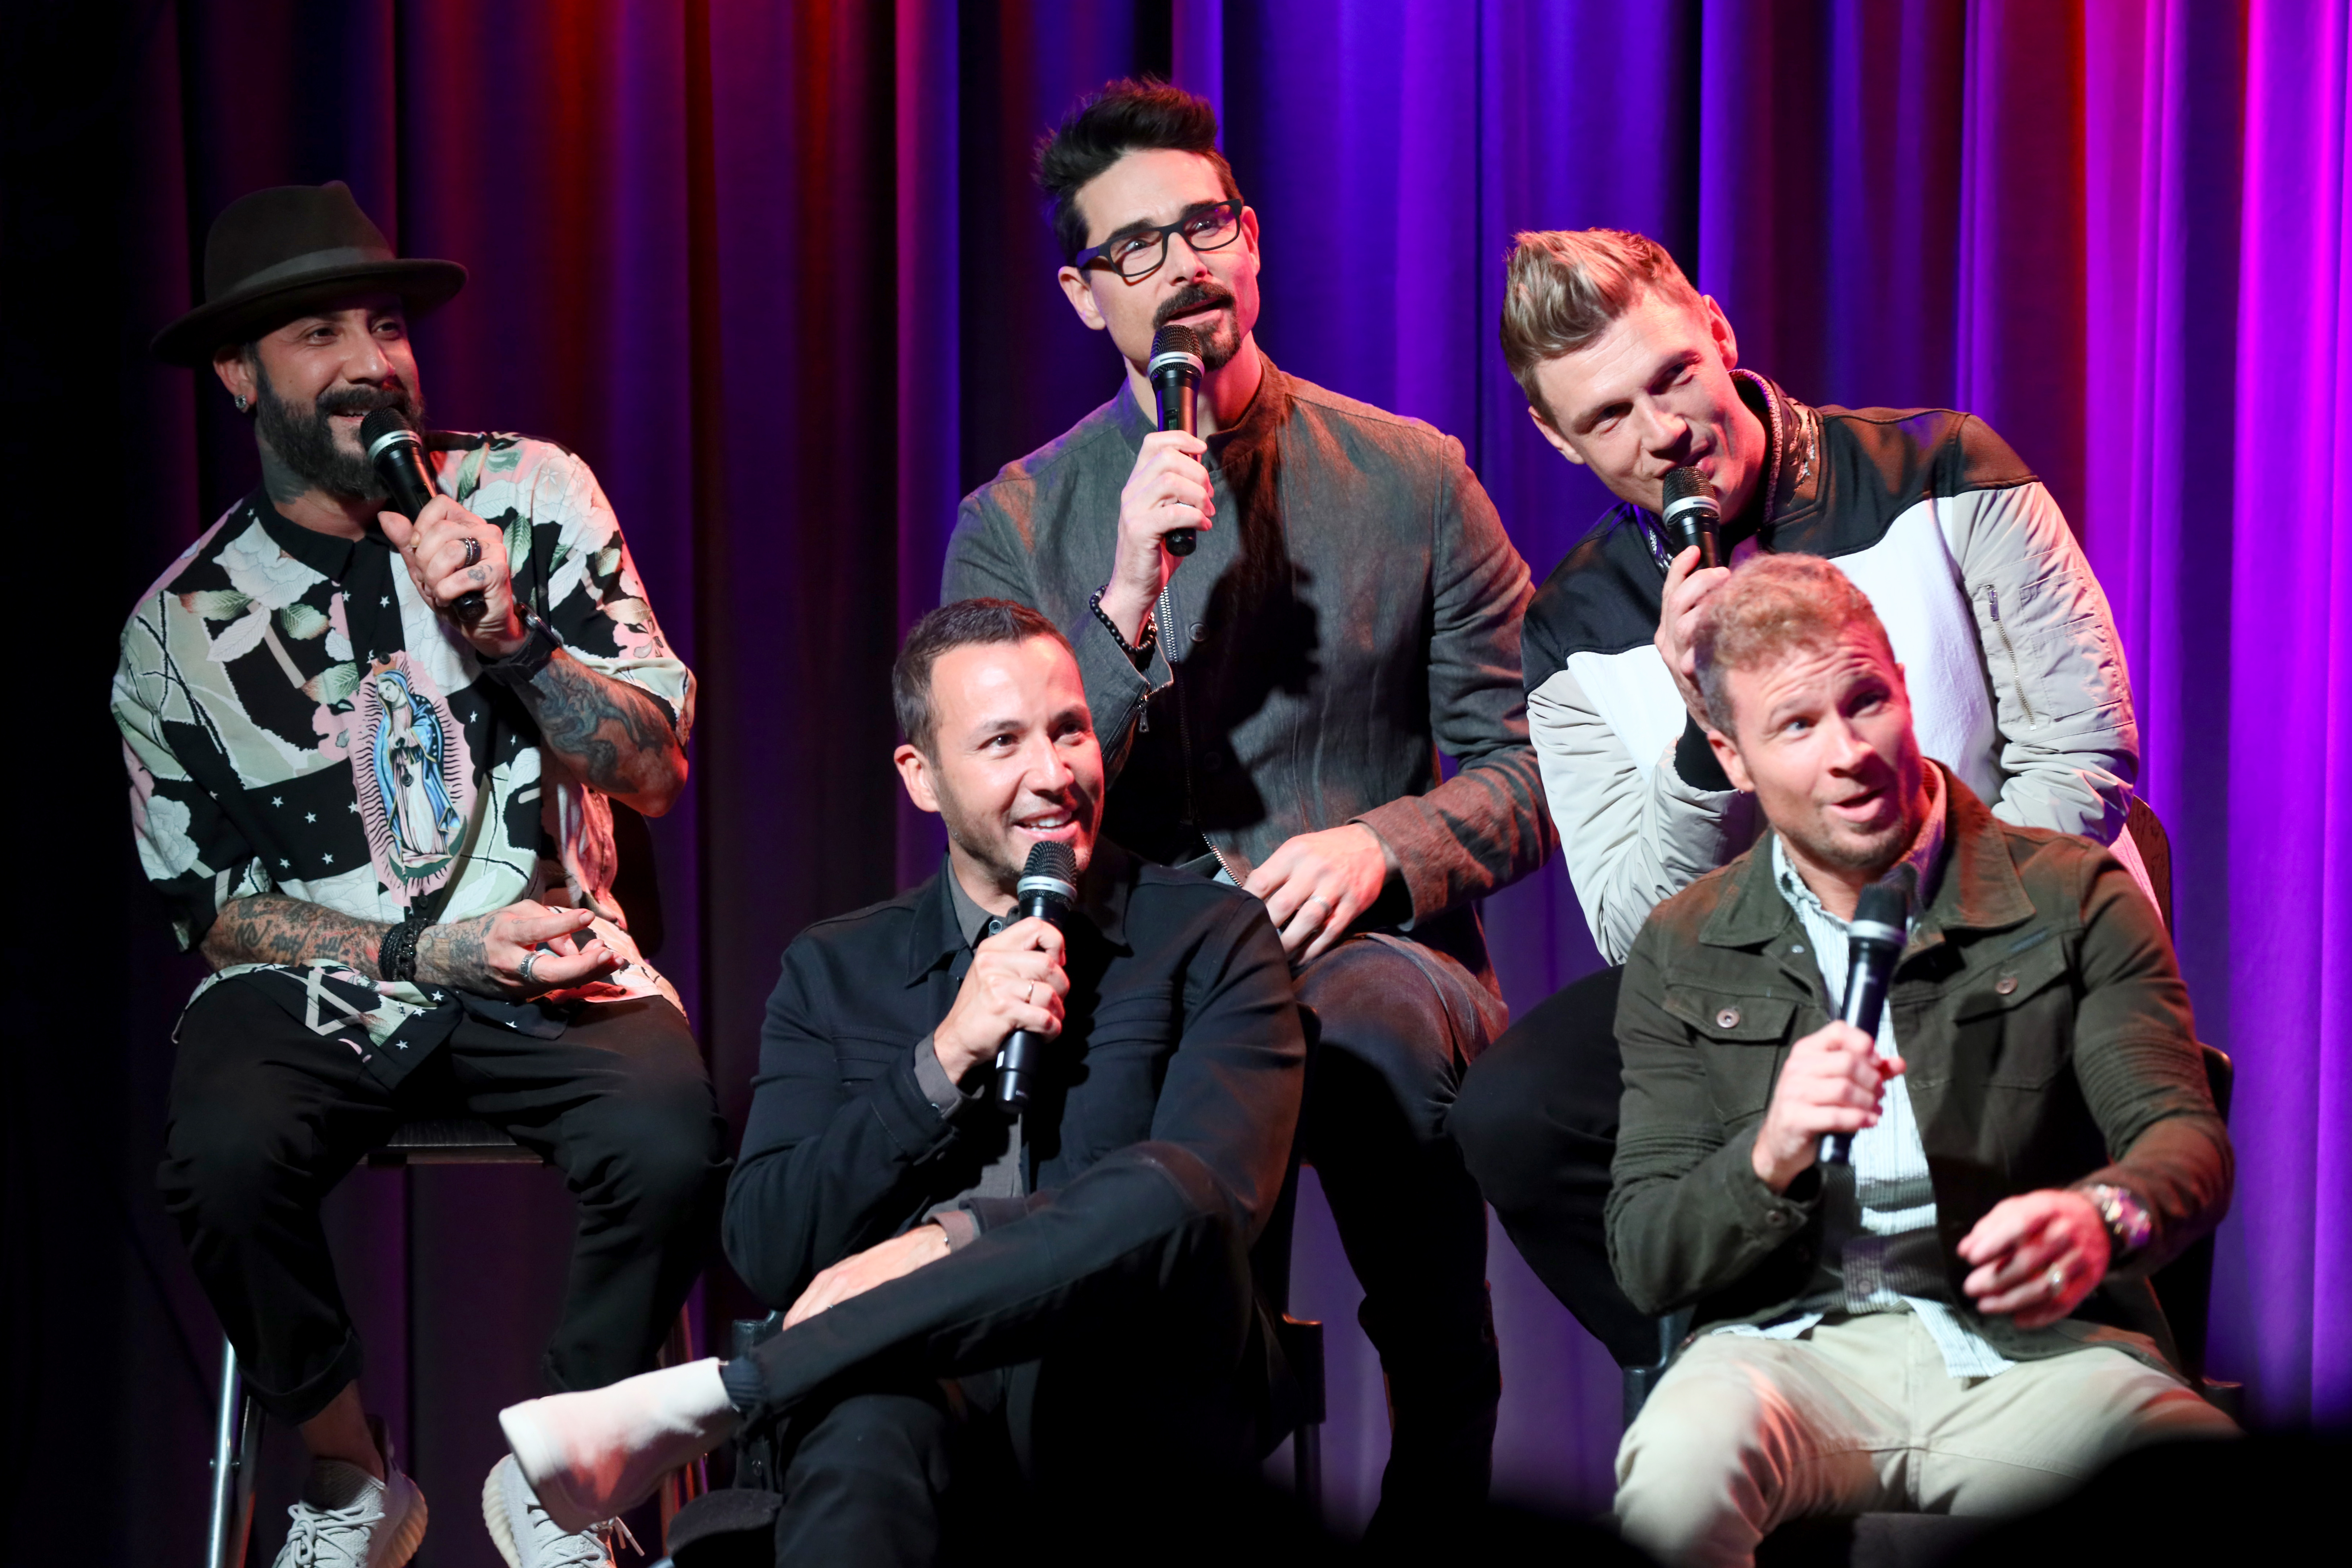 An Evening With Backstreet Boys